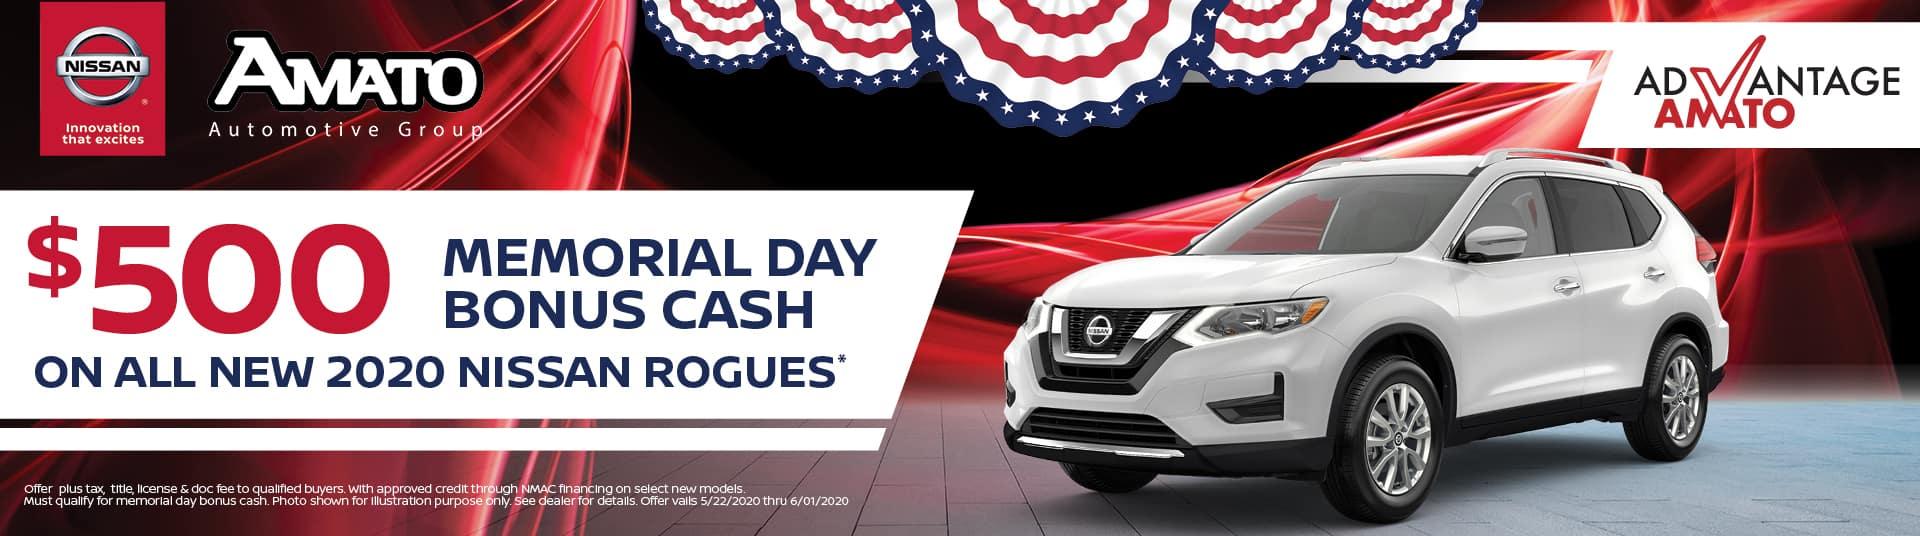 Memorial Day Bonus Cash Nissan Rogue